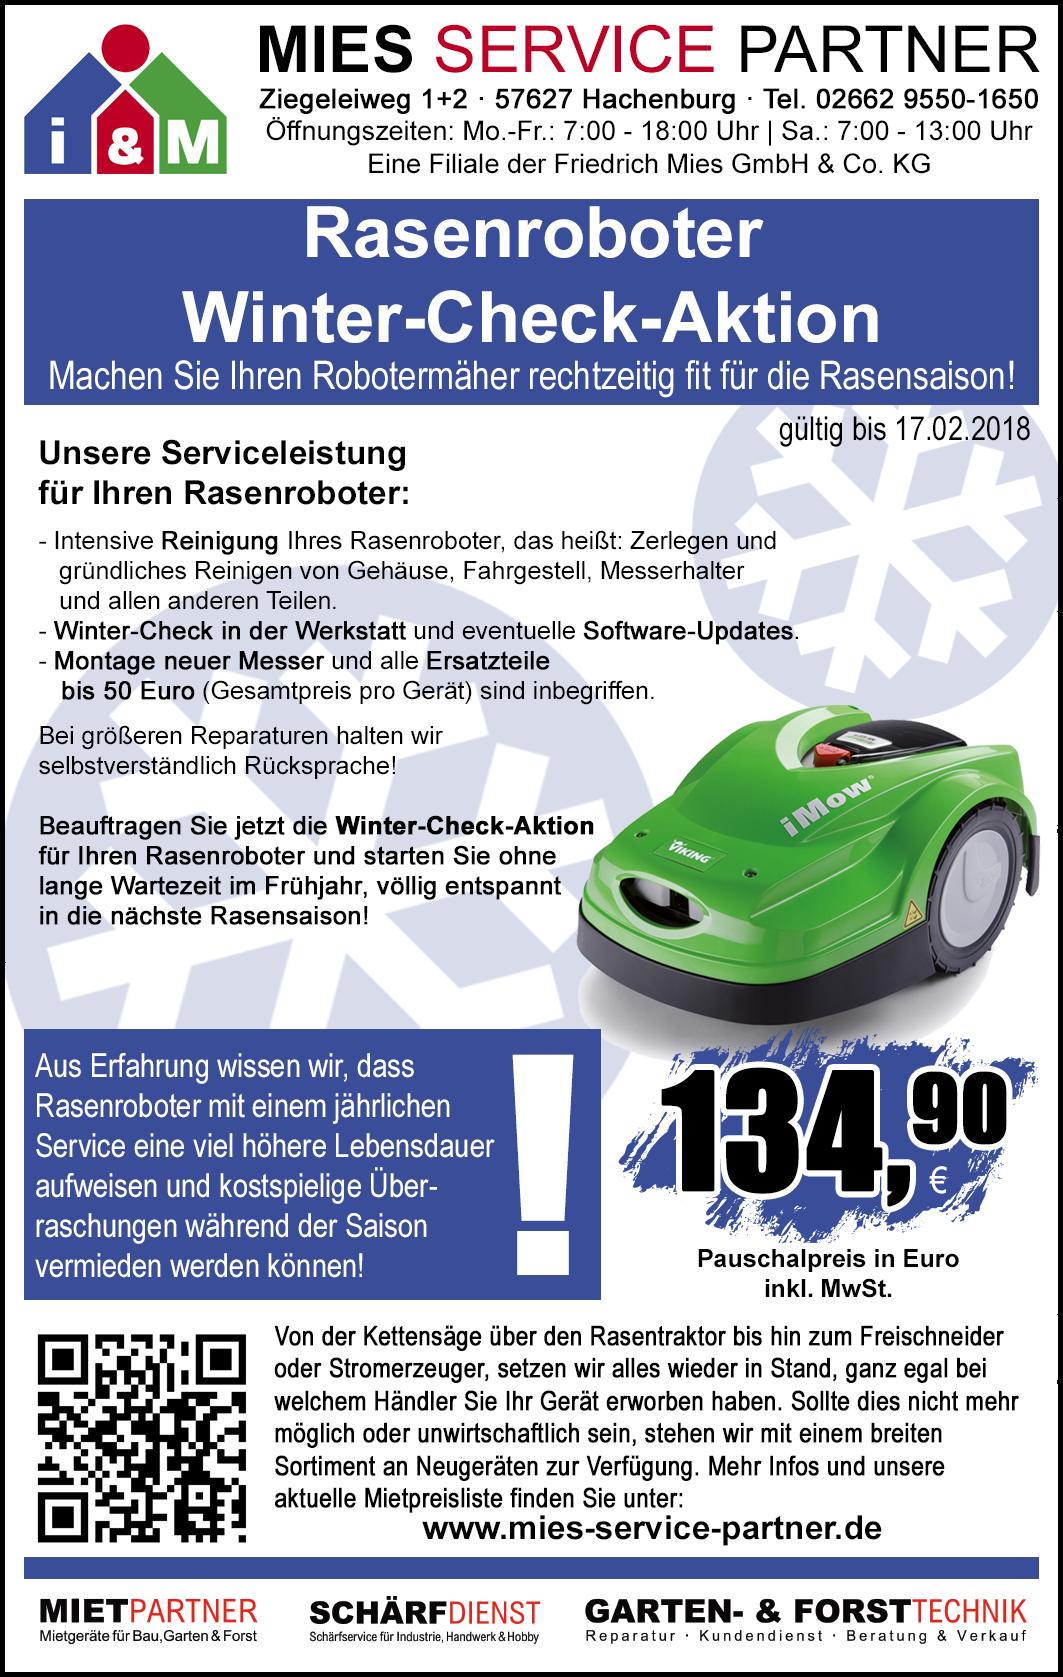 rasenroboter winter-check-aktion - mies service partner